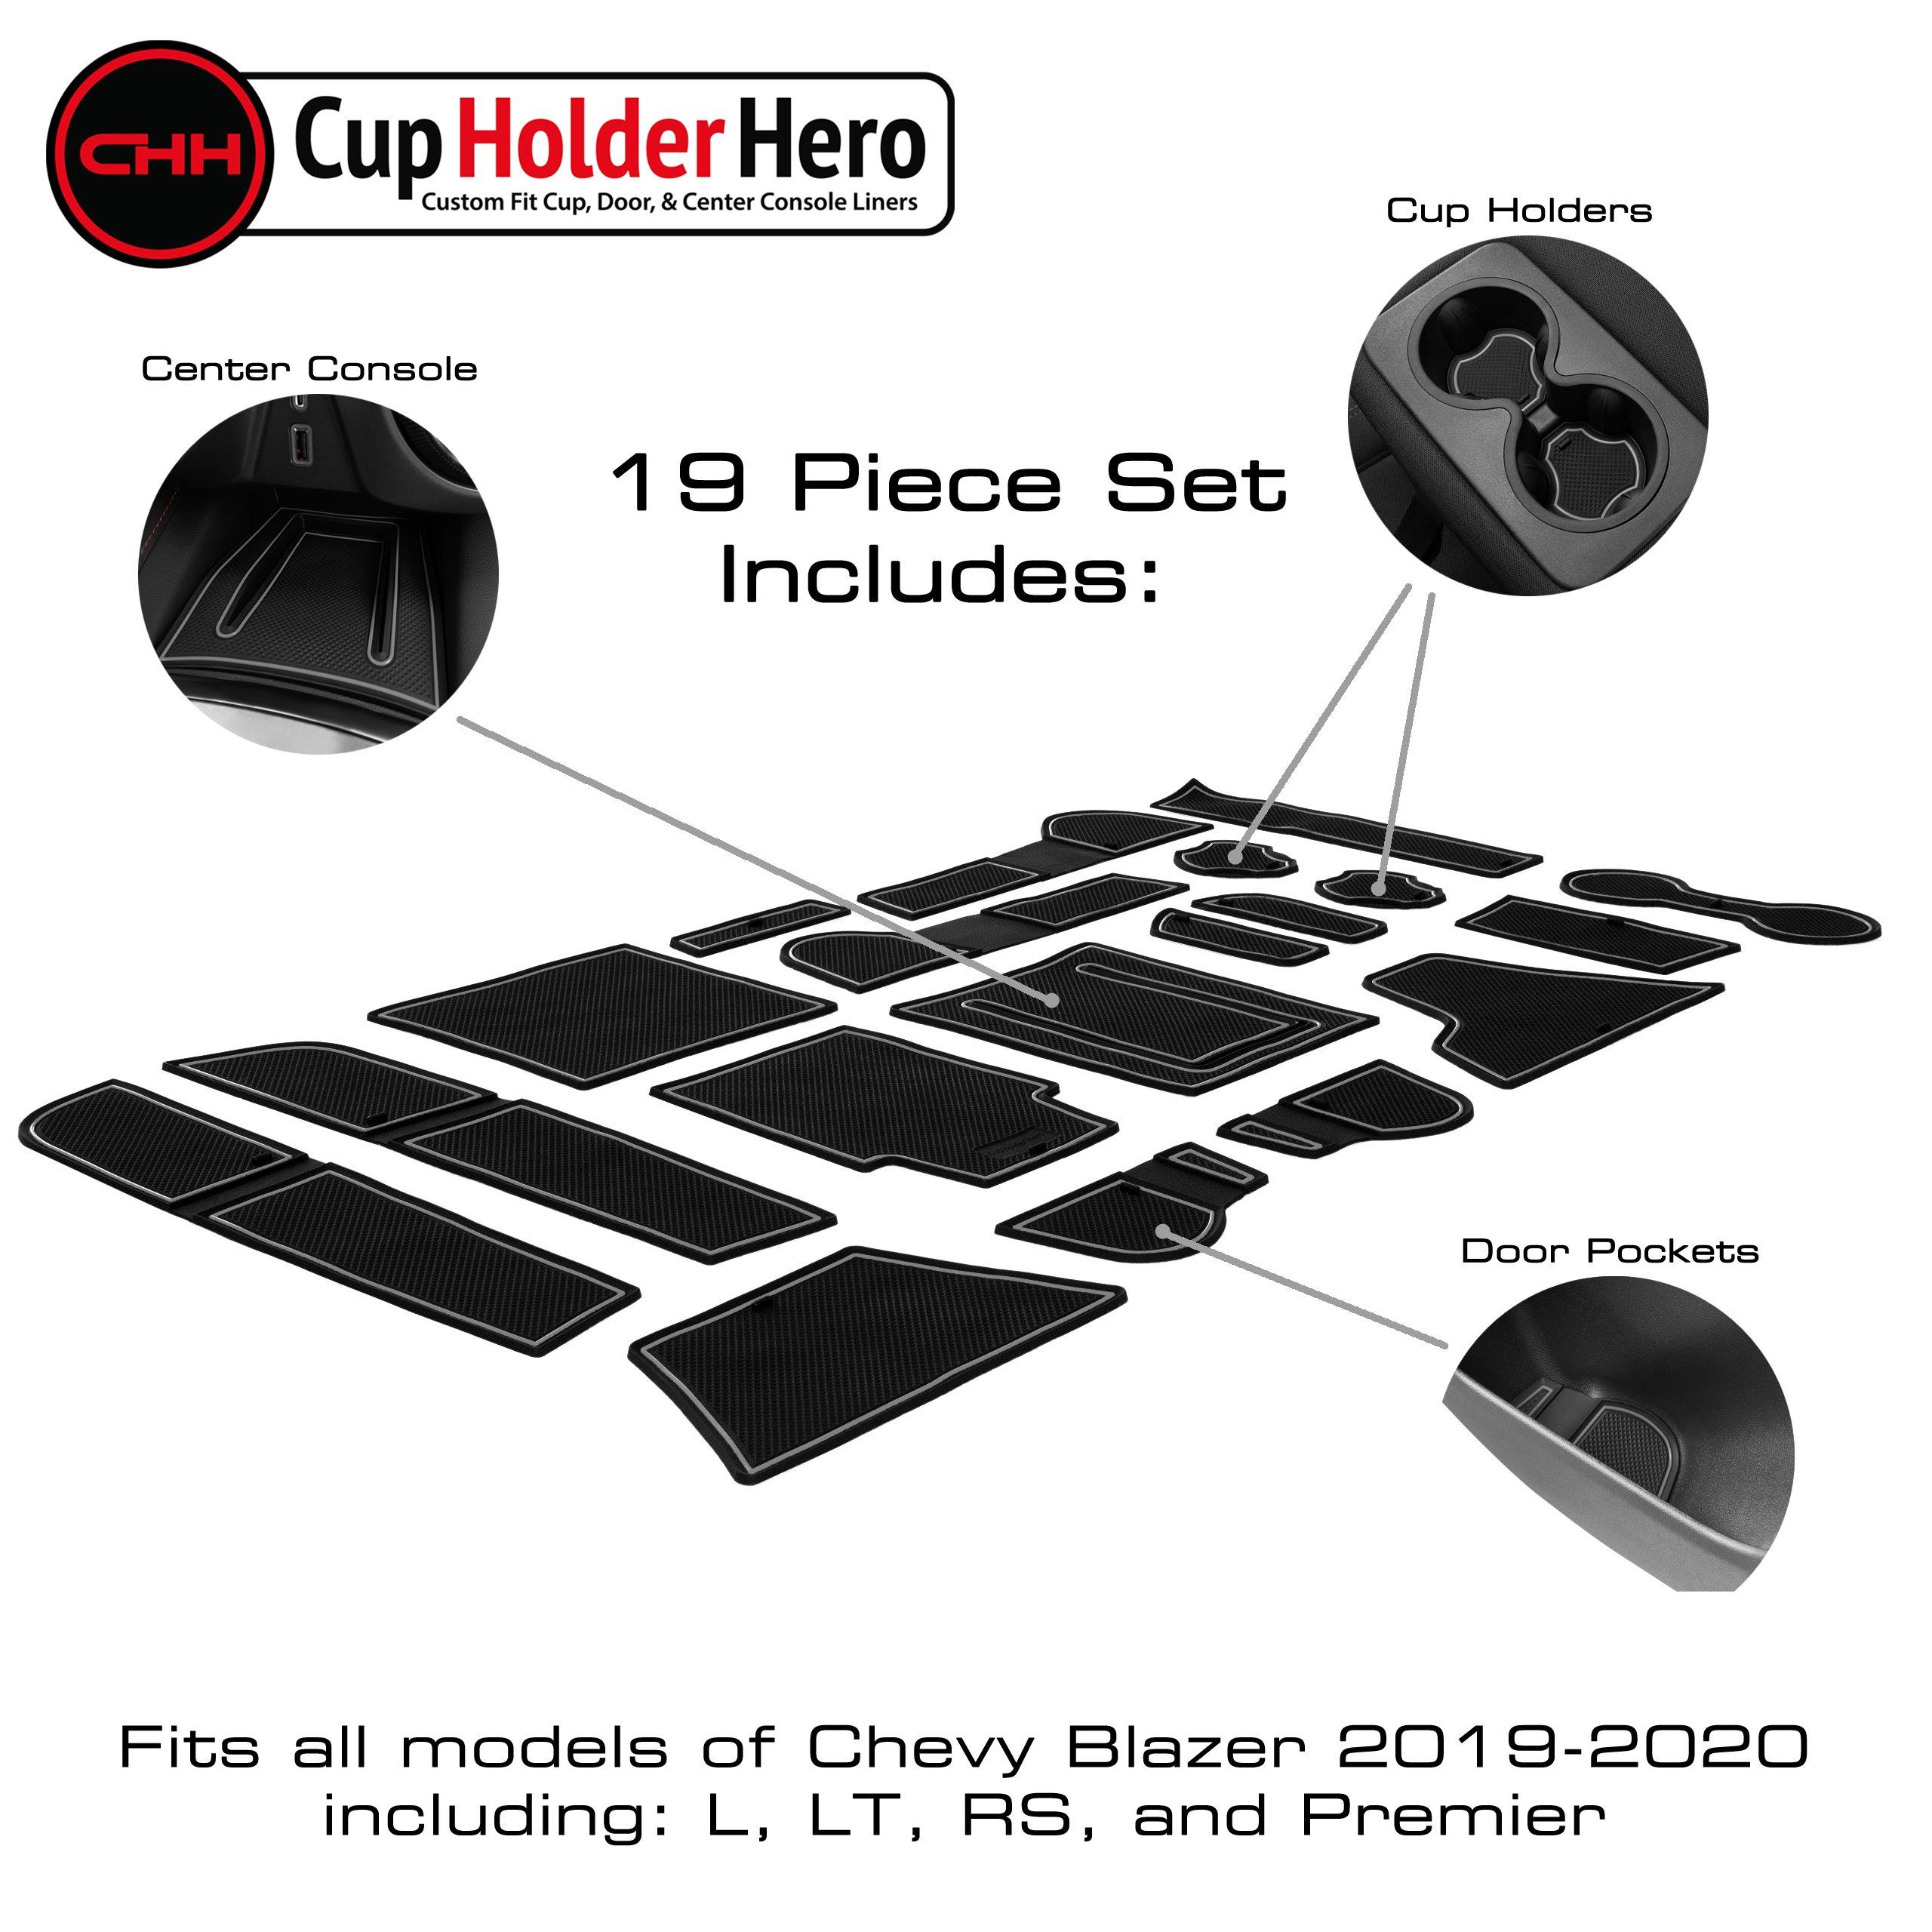 CupHolderHero-Chevy-Blazer-2019-2021-Liner-Accessories thumbnail 11